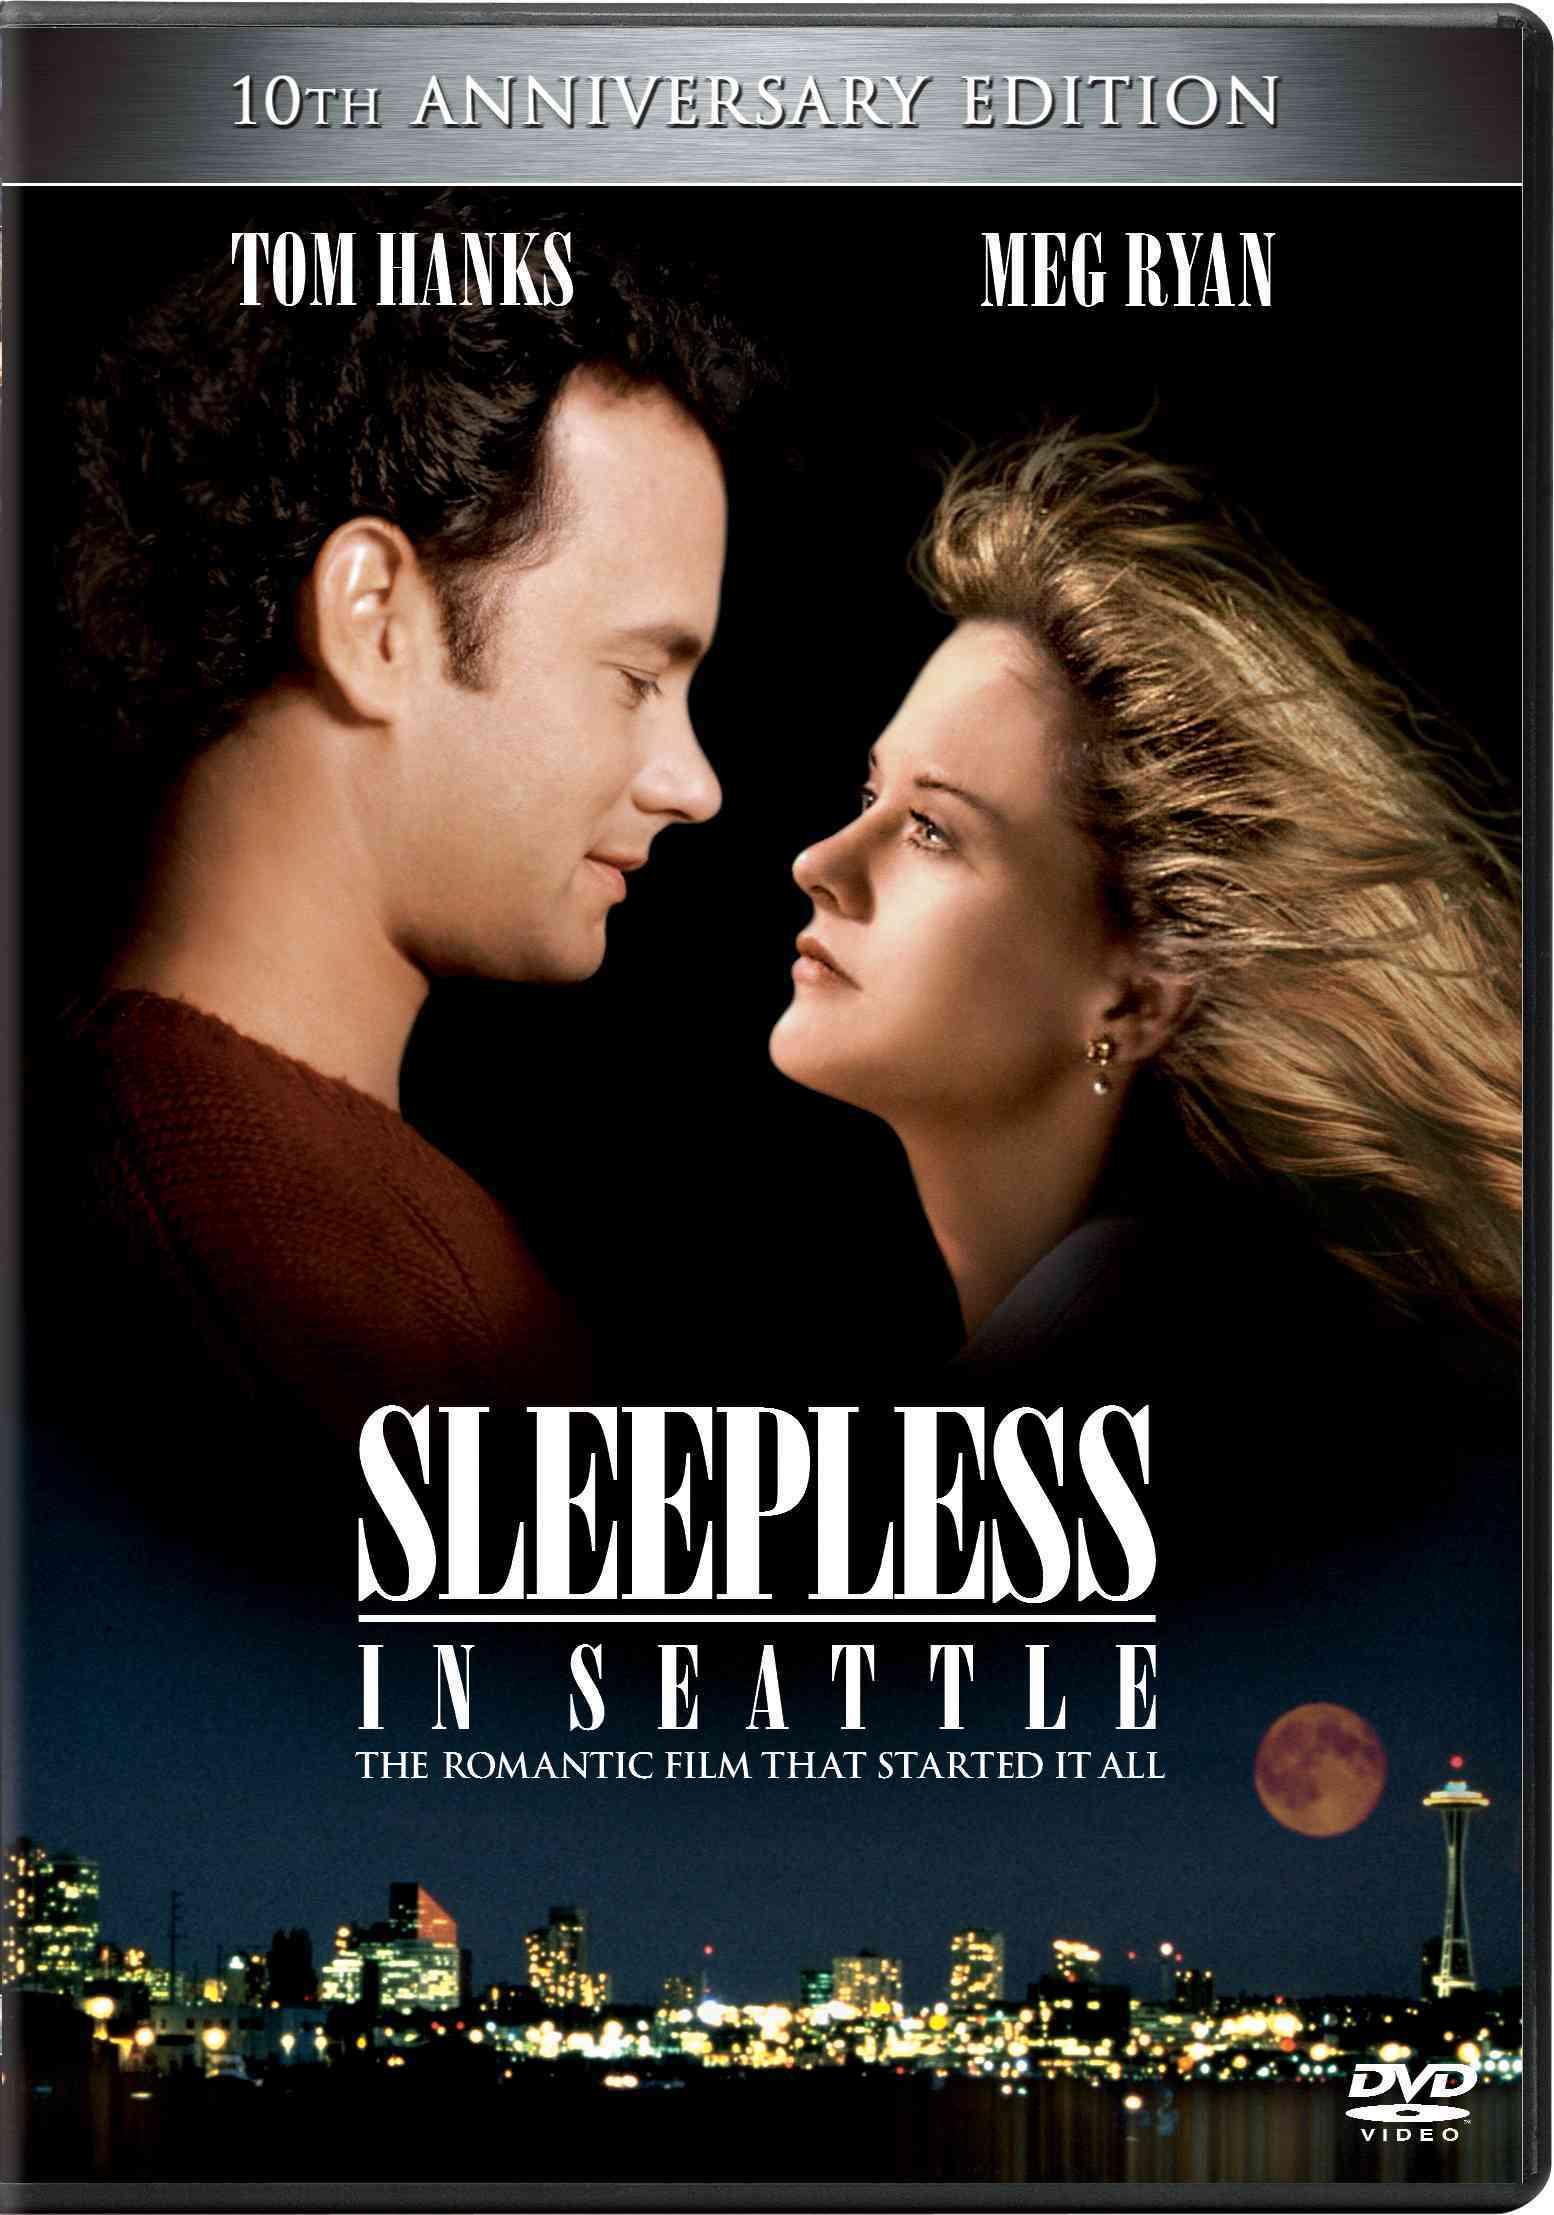 SLEEPLESS IN SEATTLE-10TH ANNIVERSARY BY HANKS,TOM (DVD)